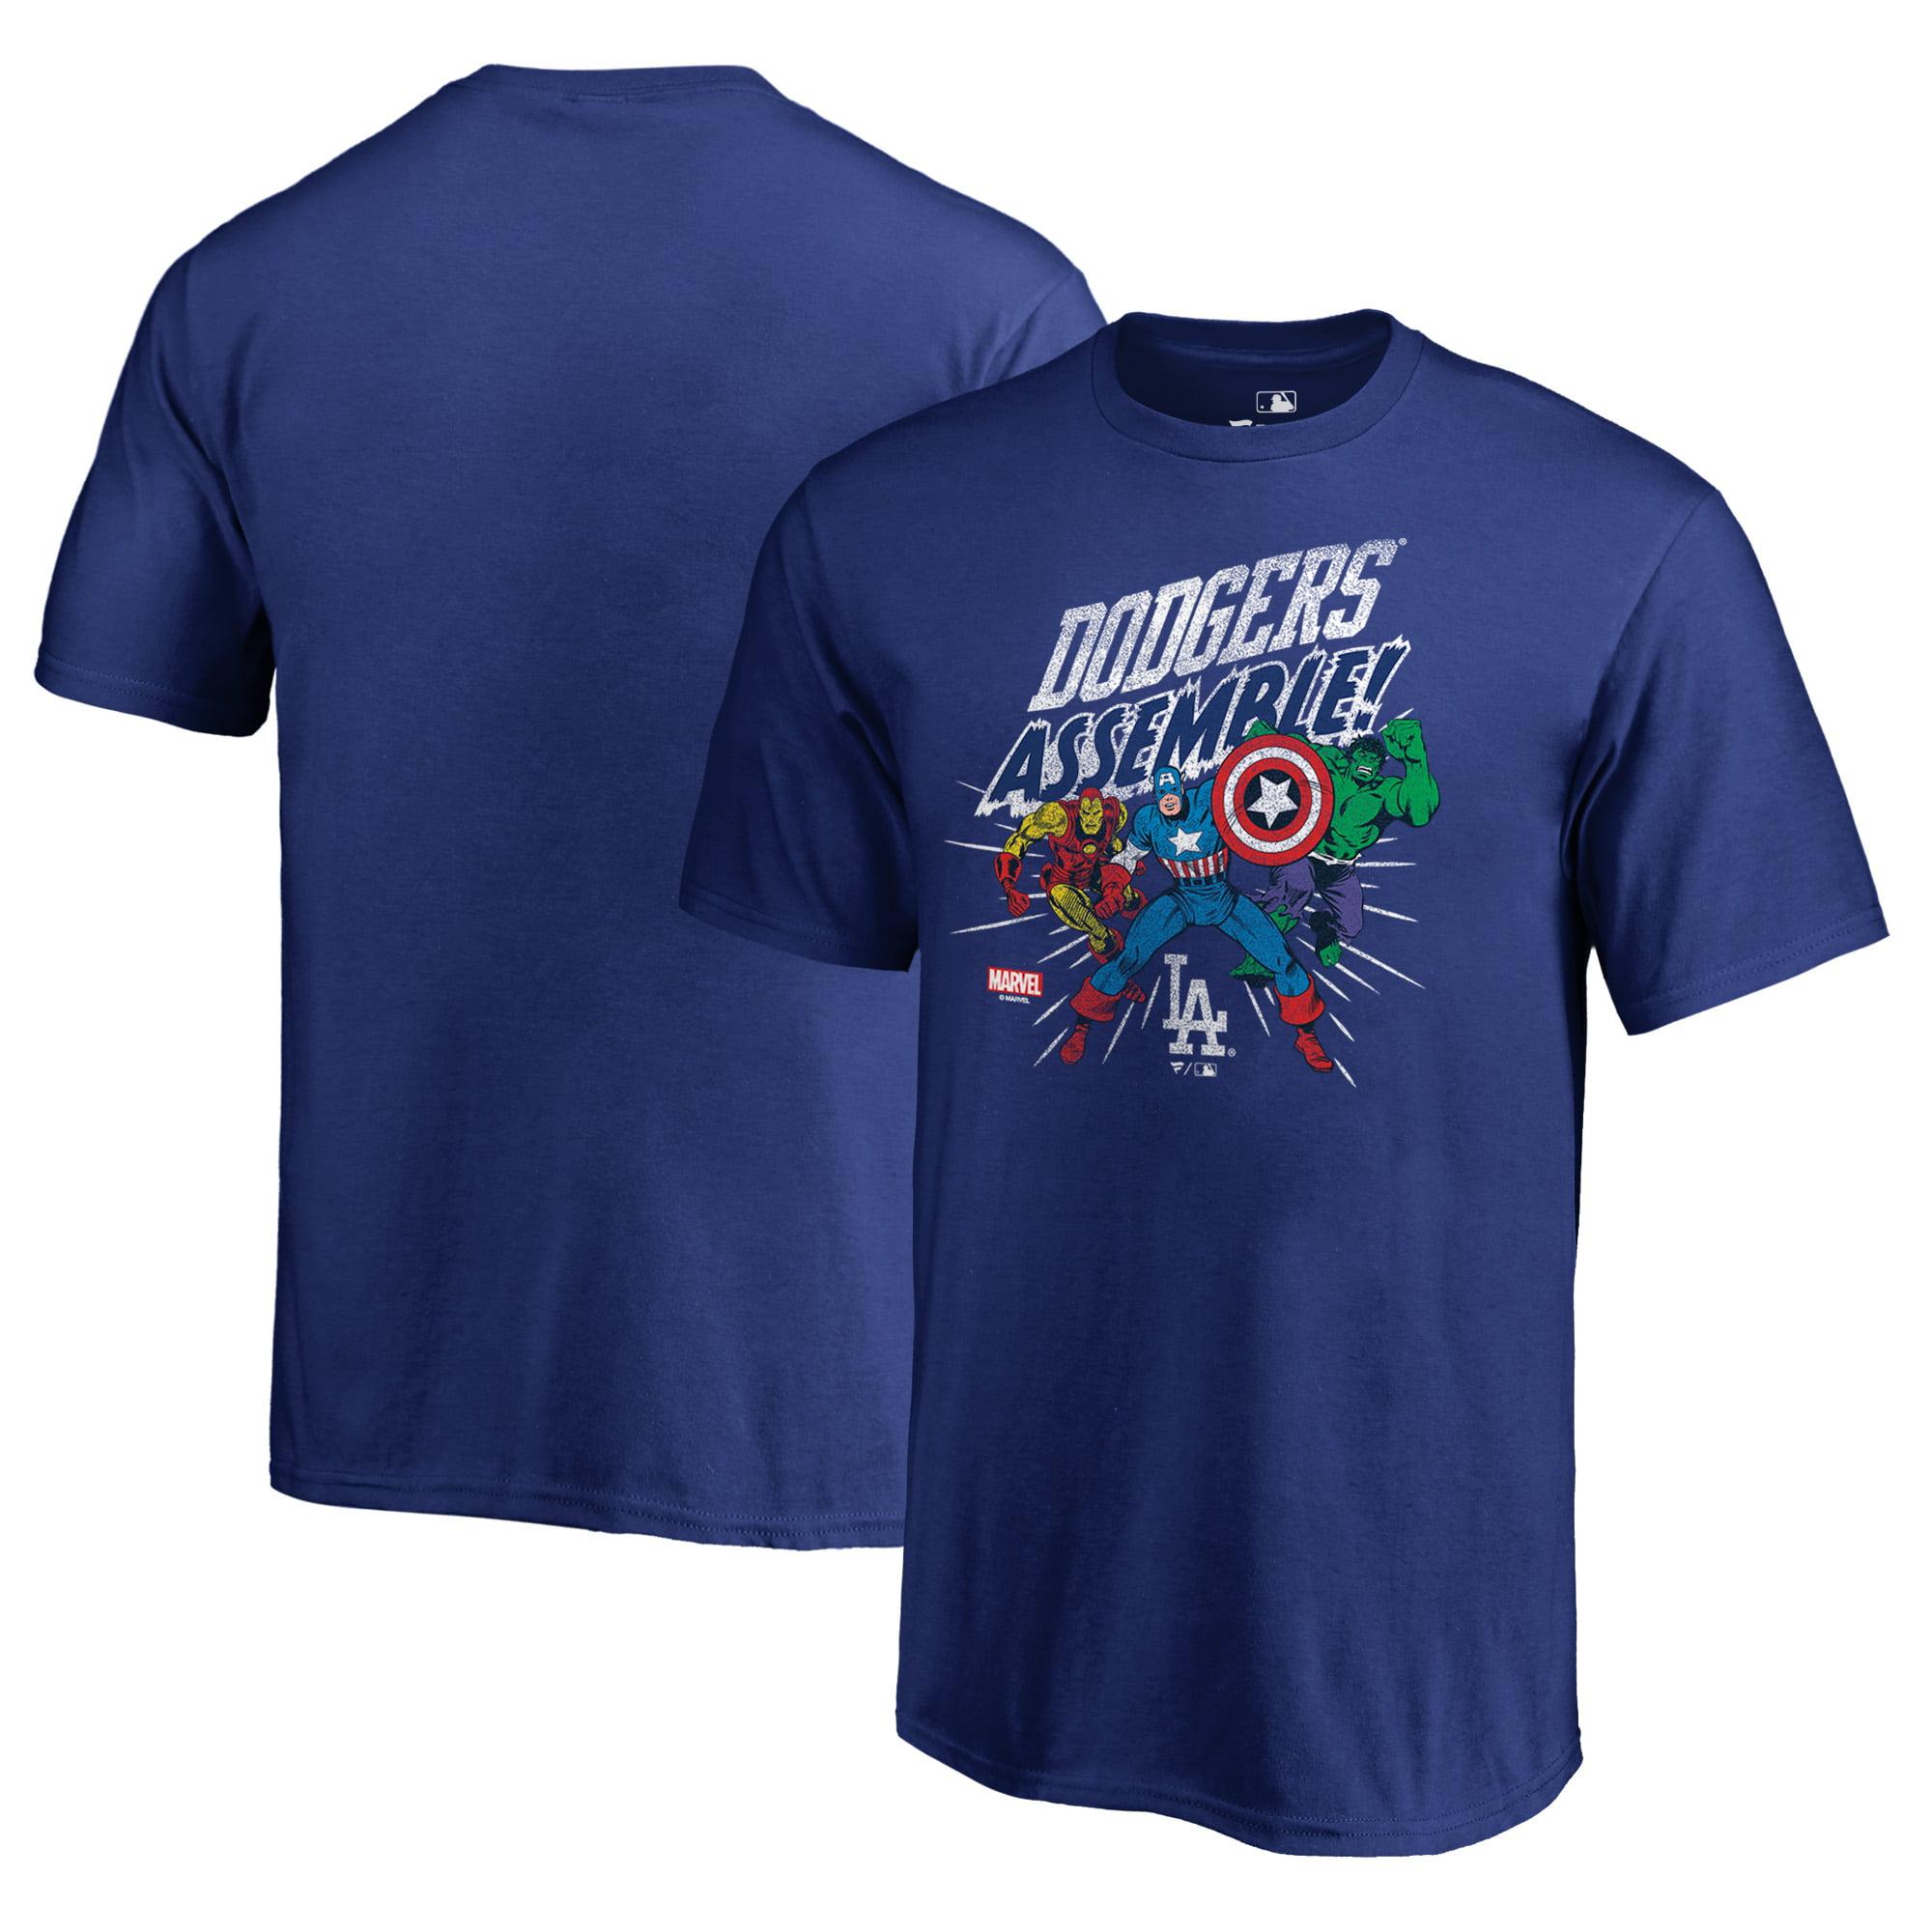 Los Angeles Dodgers Fanatics Branded Youth Marvel Avengers Assemble T-Shirt - Royal